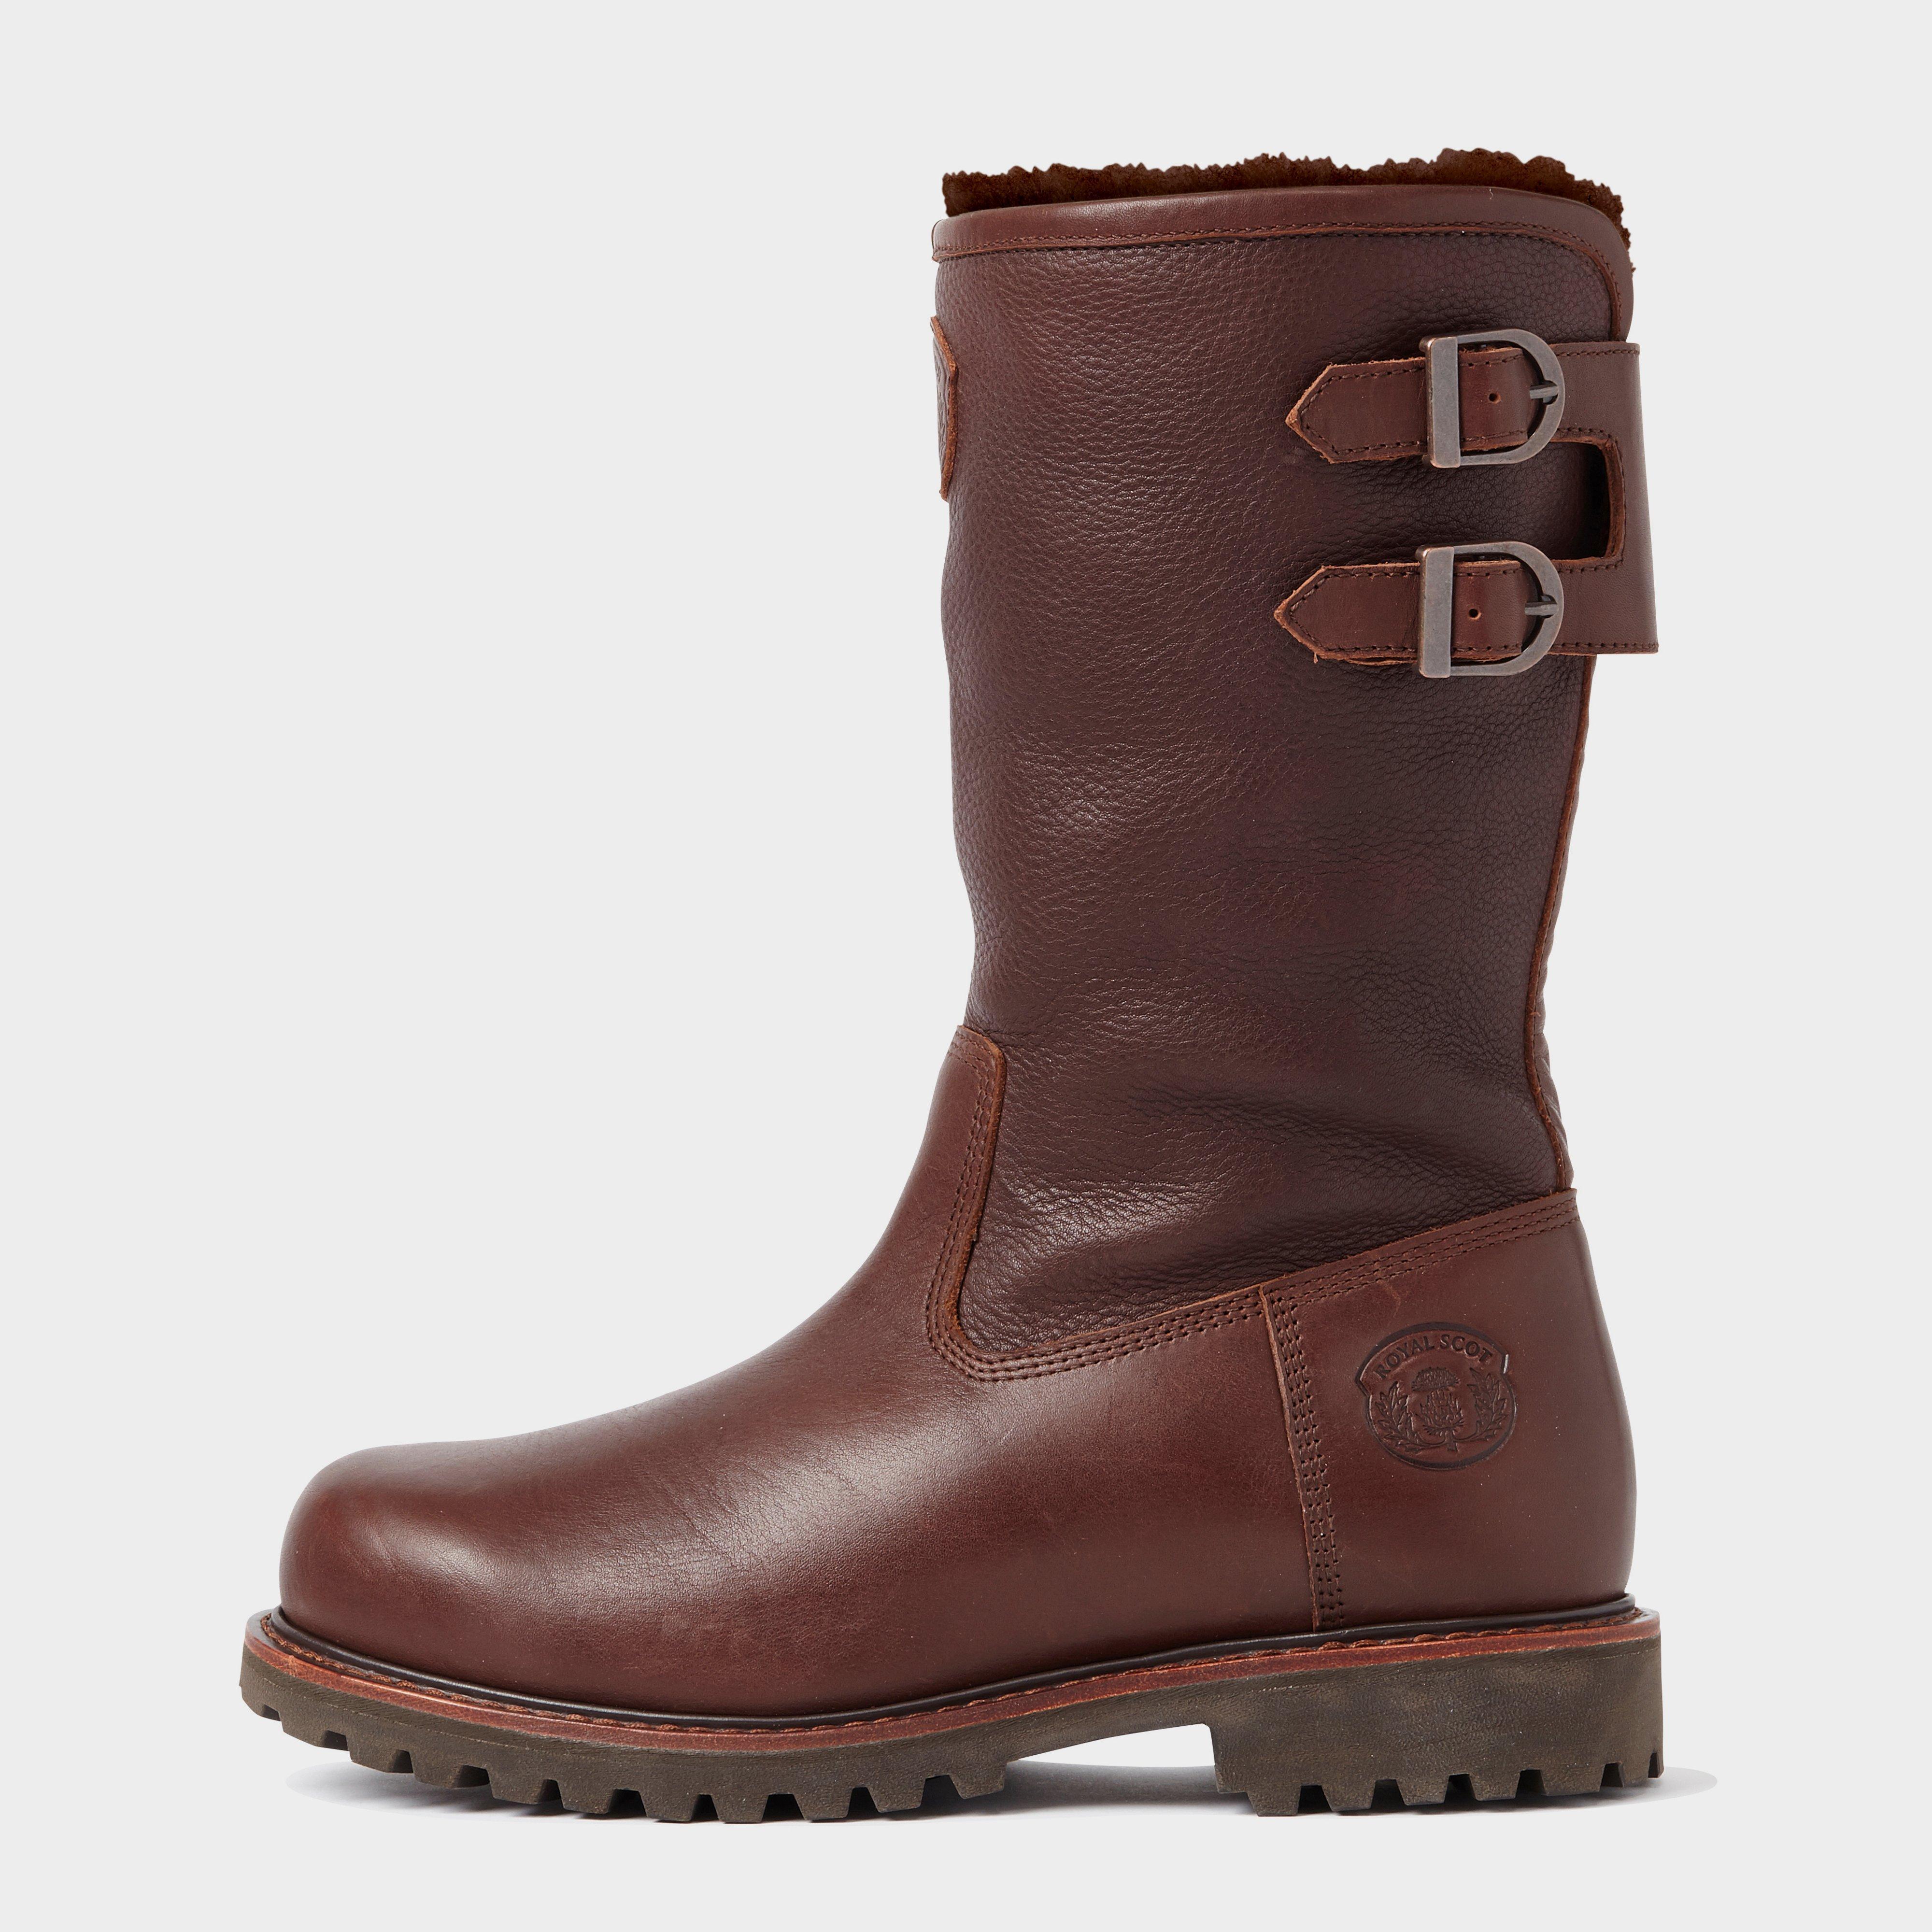 Royal Scot Mens Nevis Boot - Brown/brown  Brown/brown